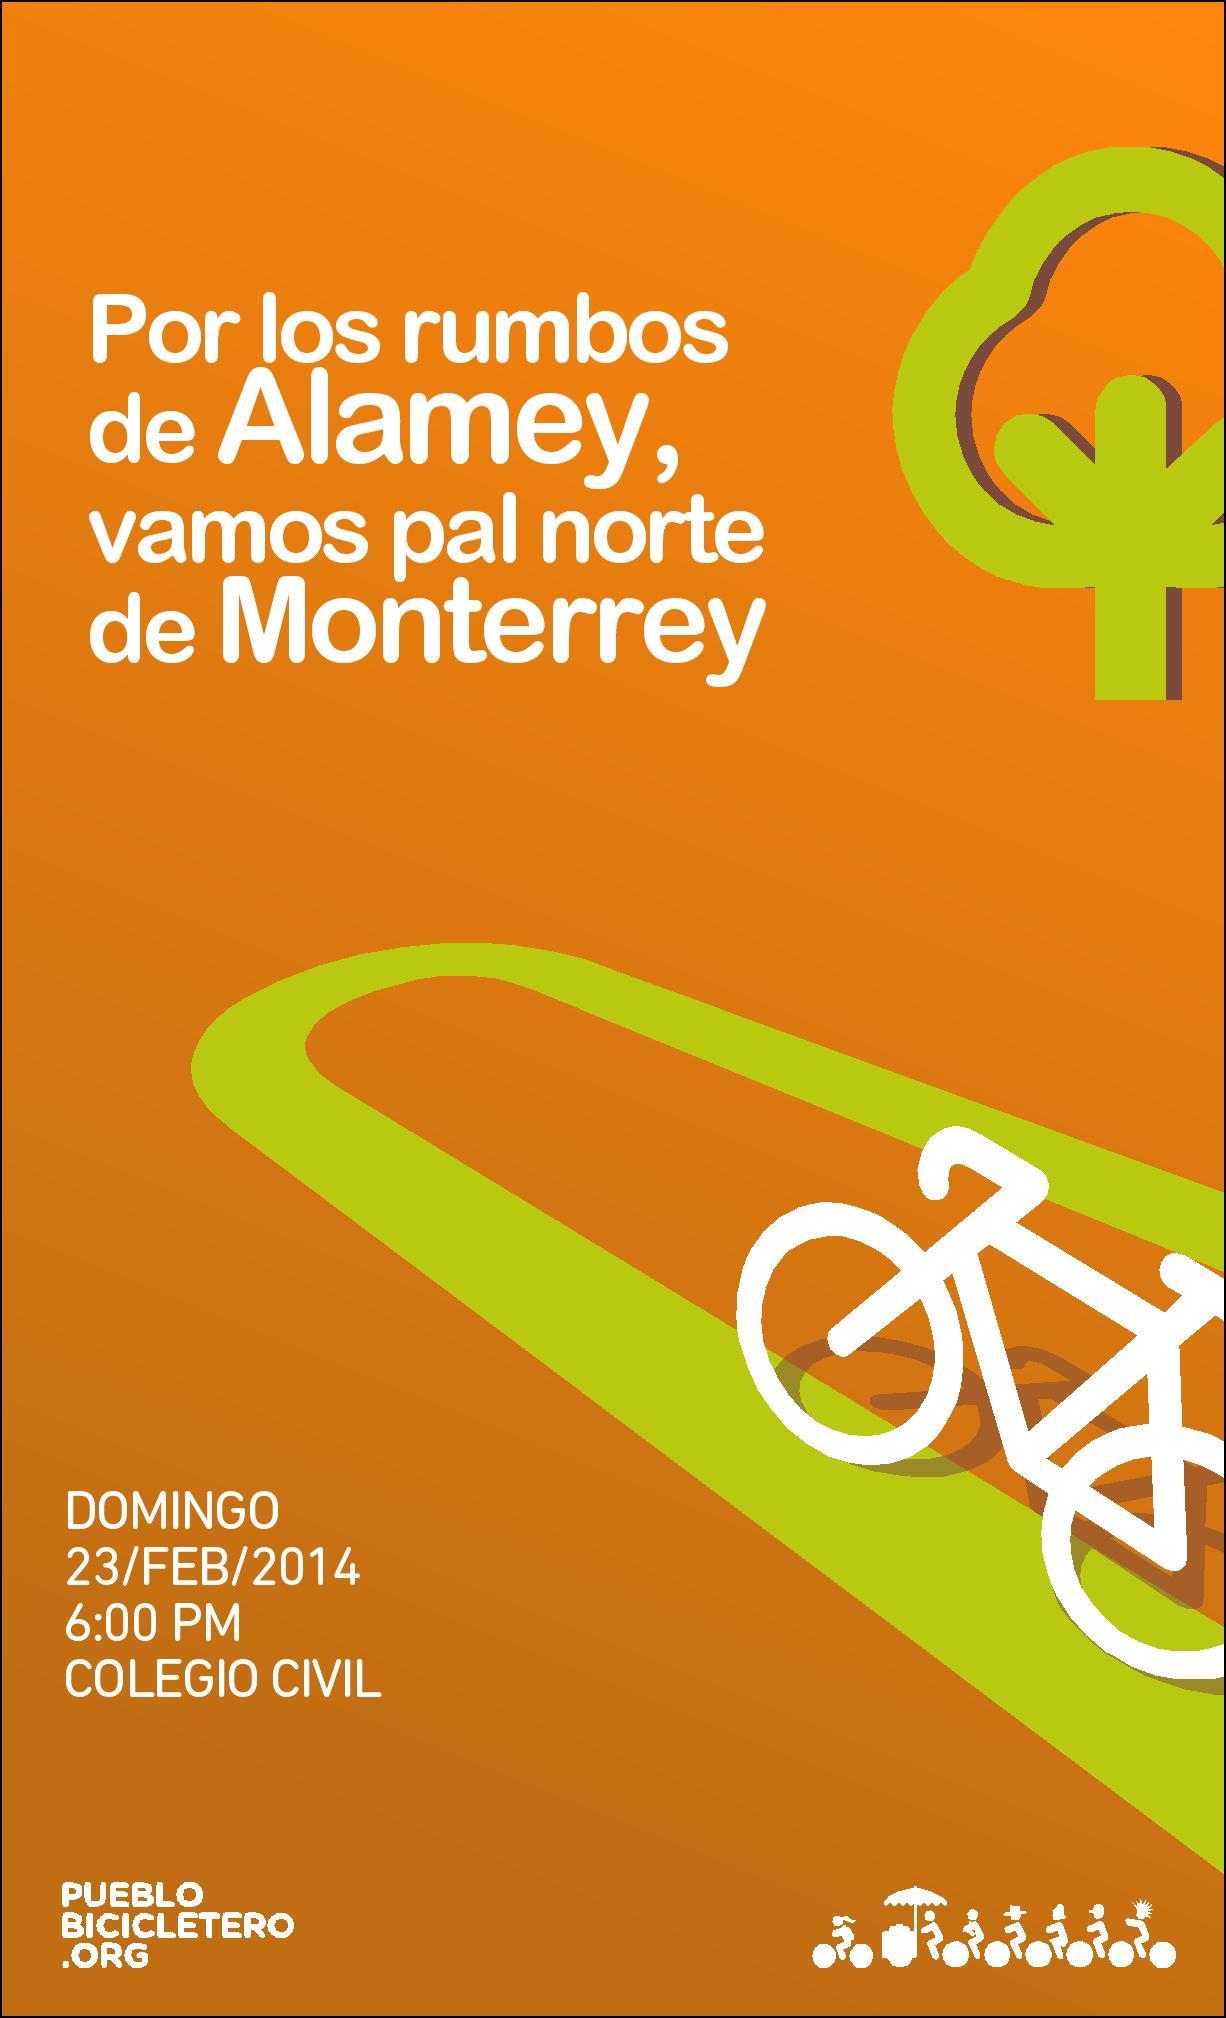 poster alamey (1)